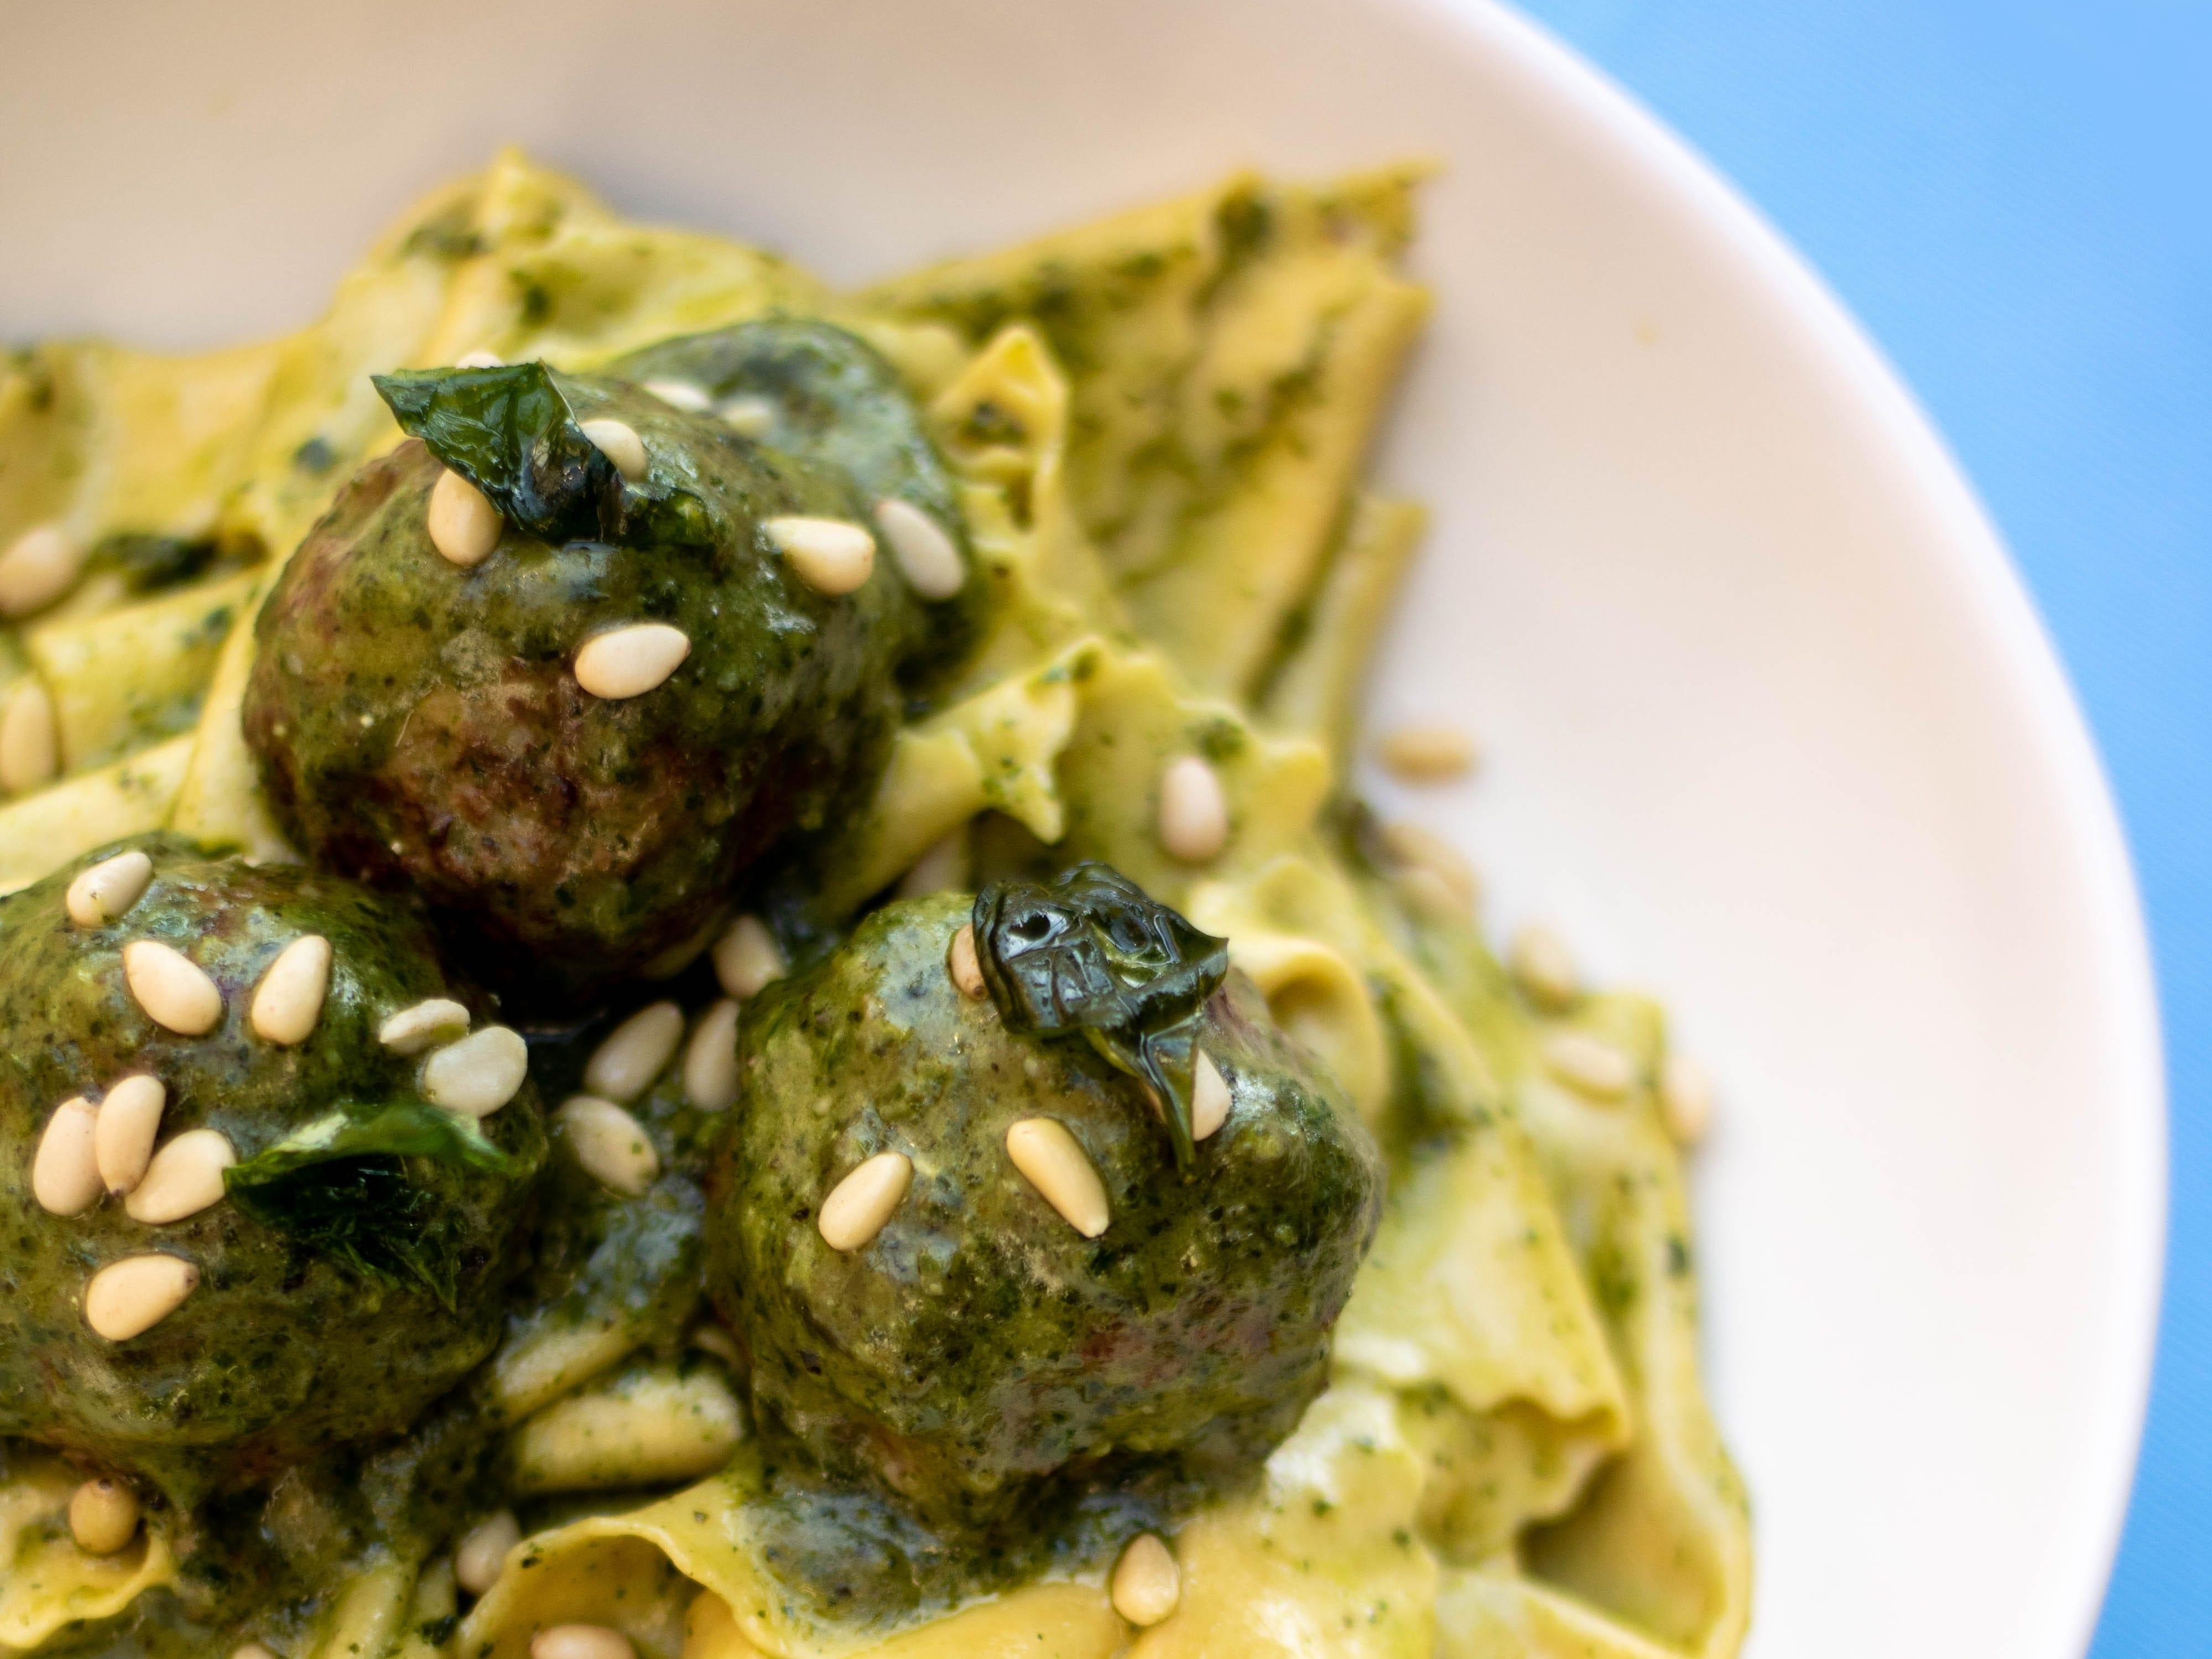 Mandili pasta with Pesto